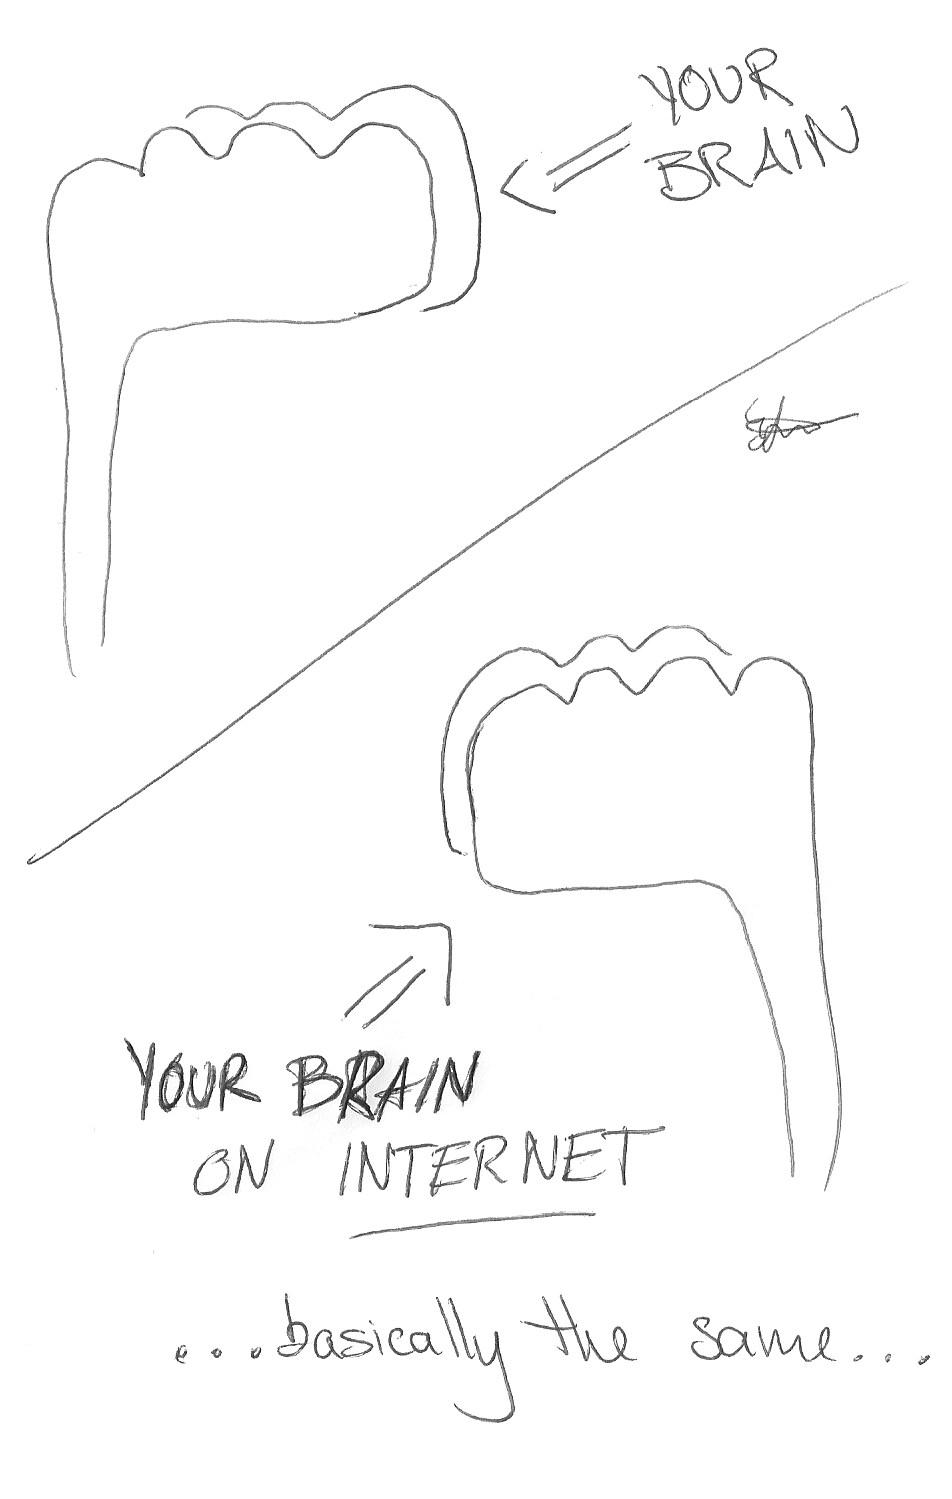 Your Brain on Internet